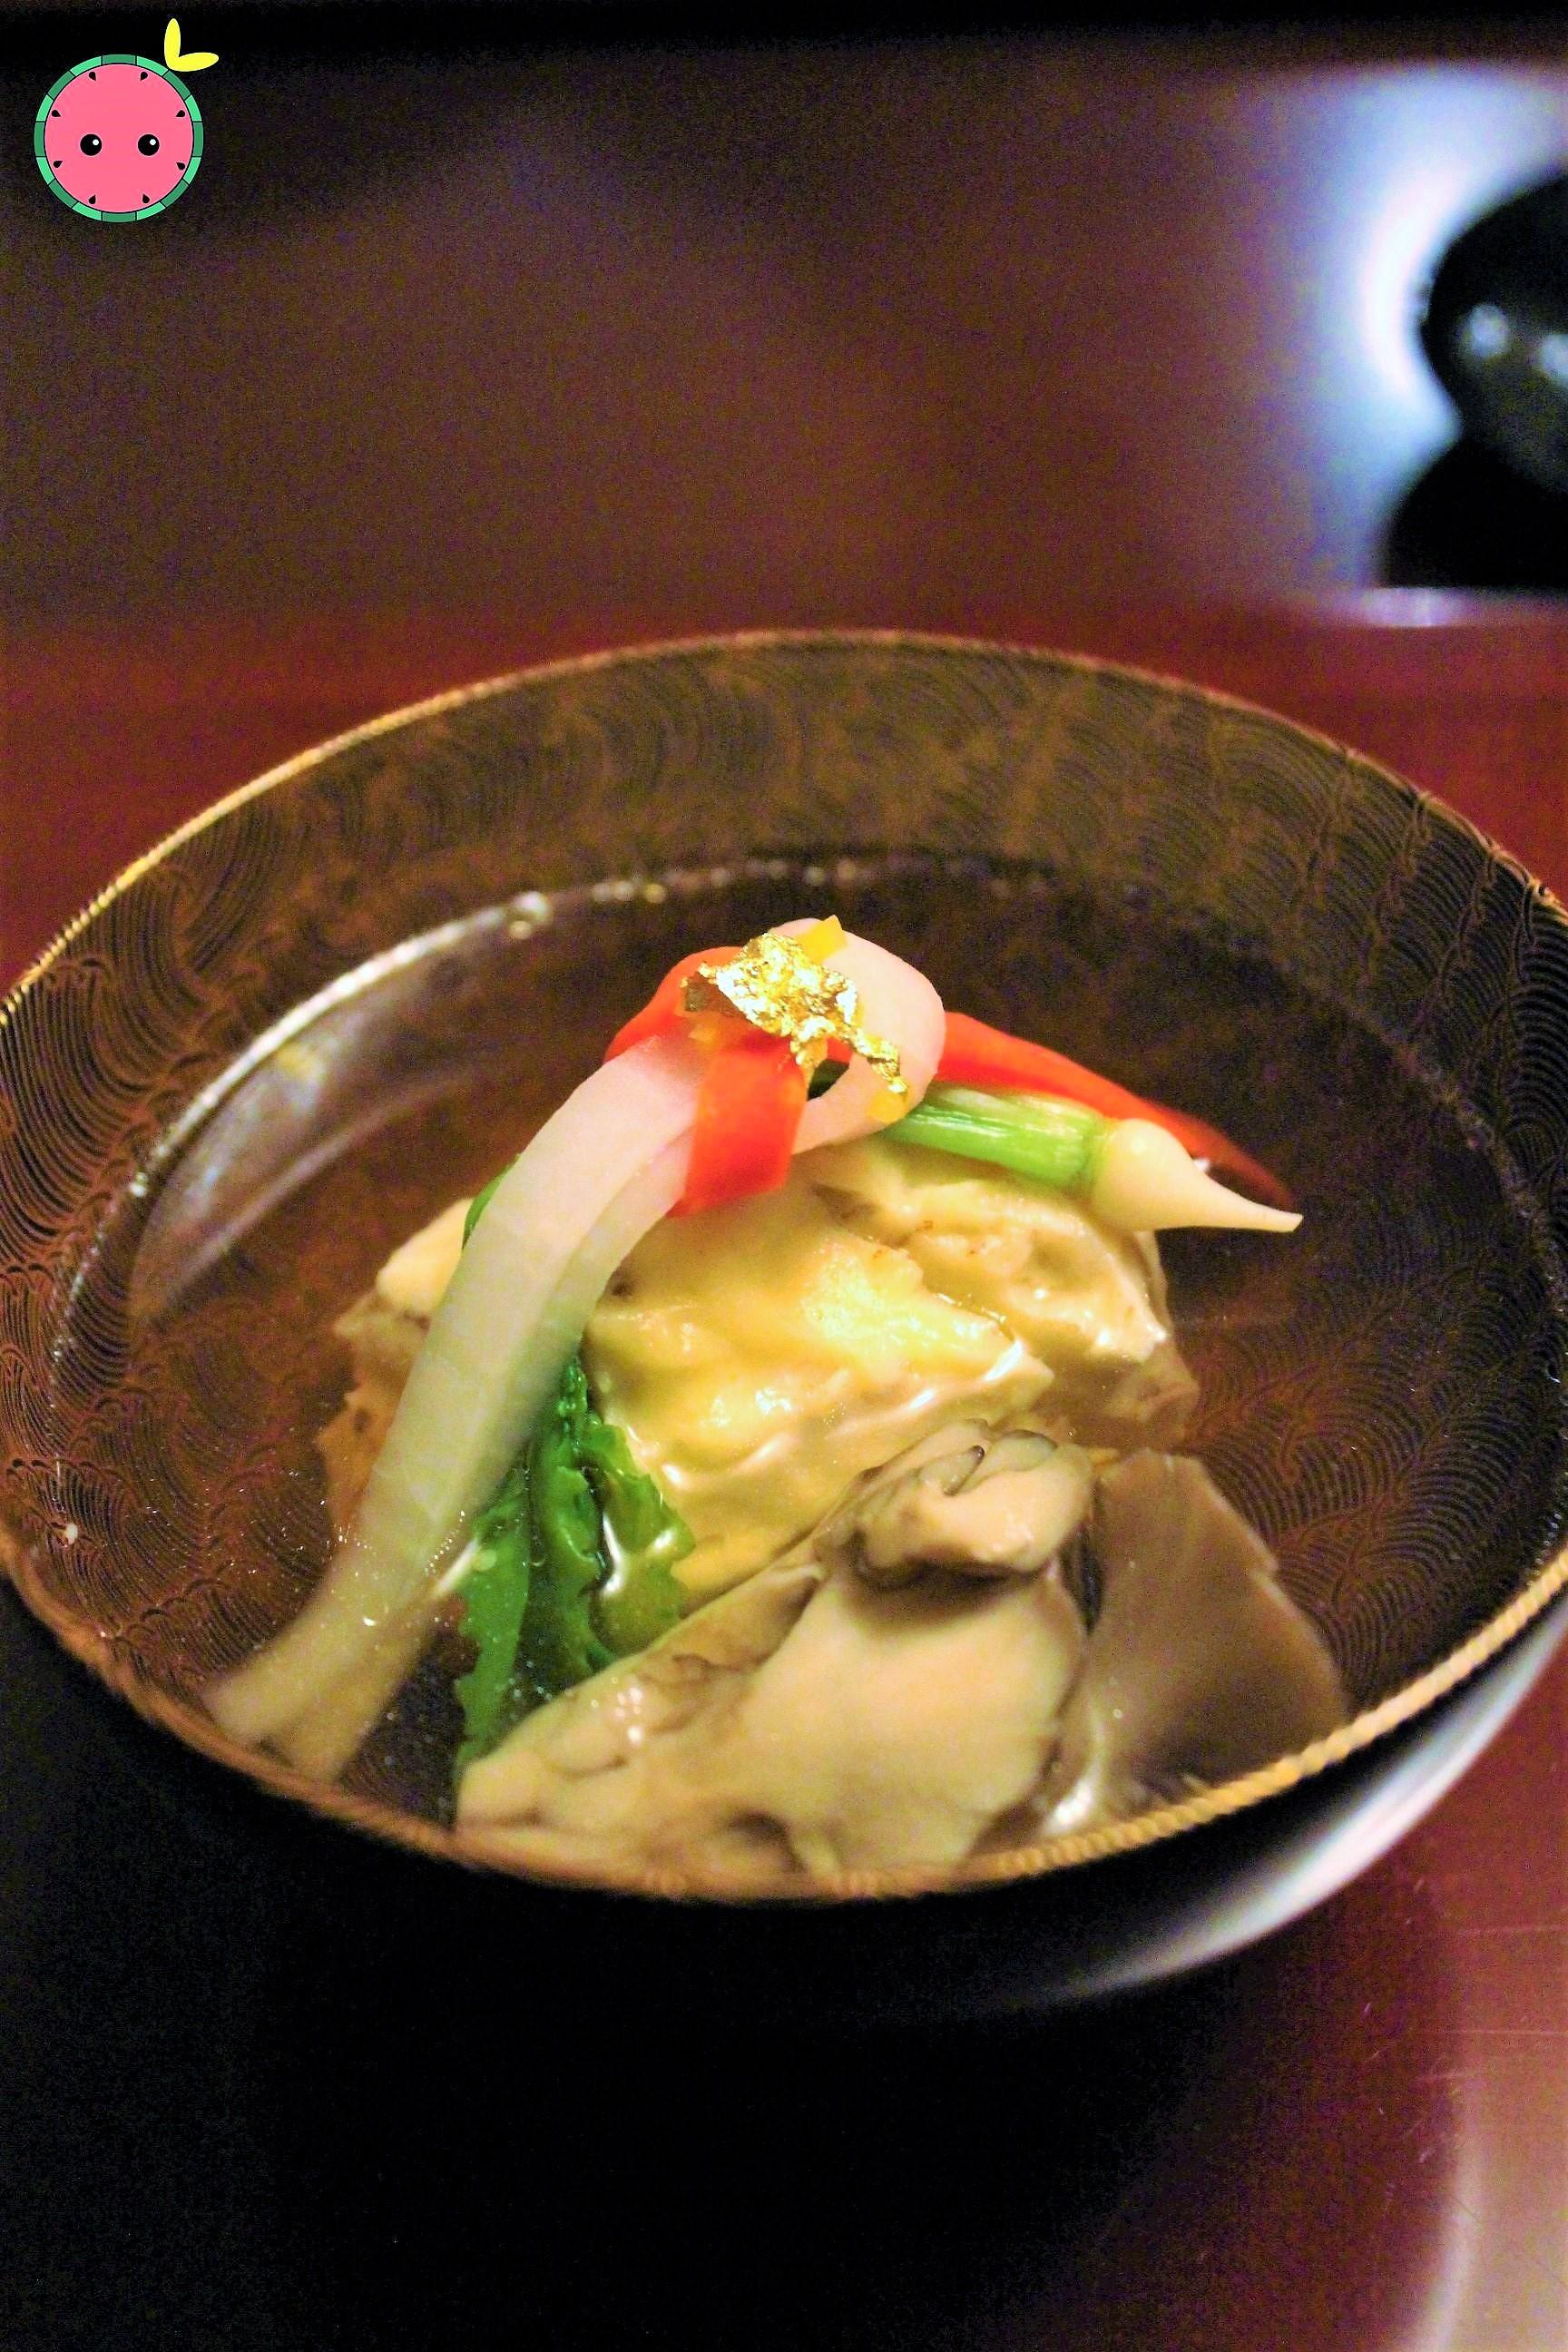 Hotate with Maitake Mushroom, Carrot, and Radish in Fish Broth